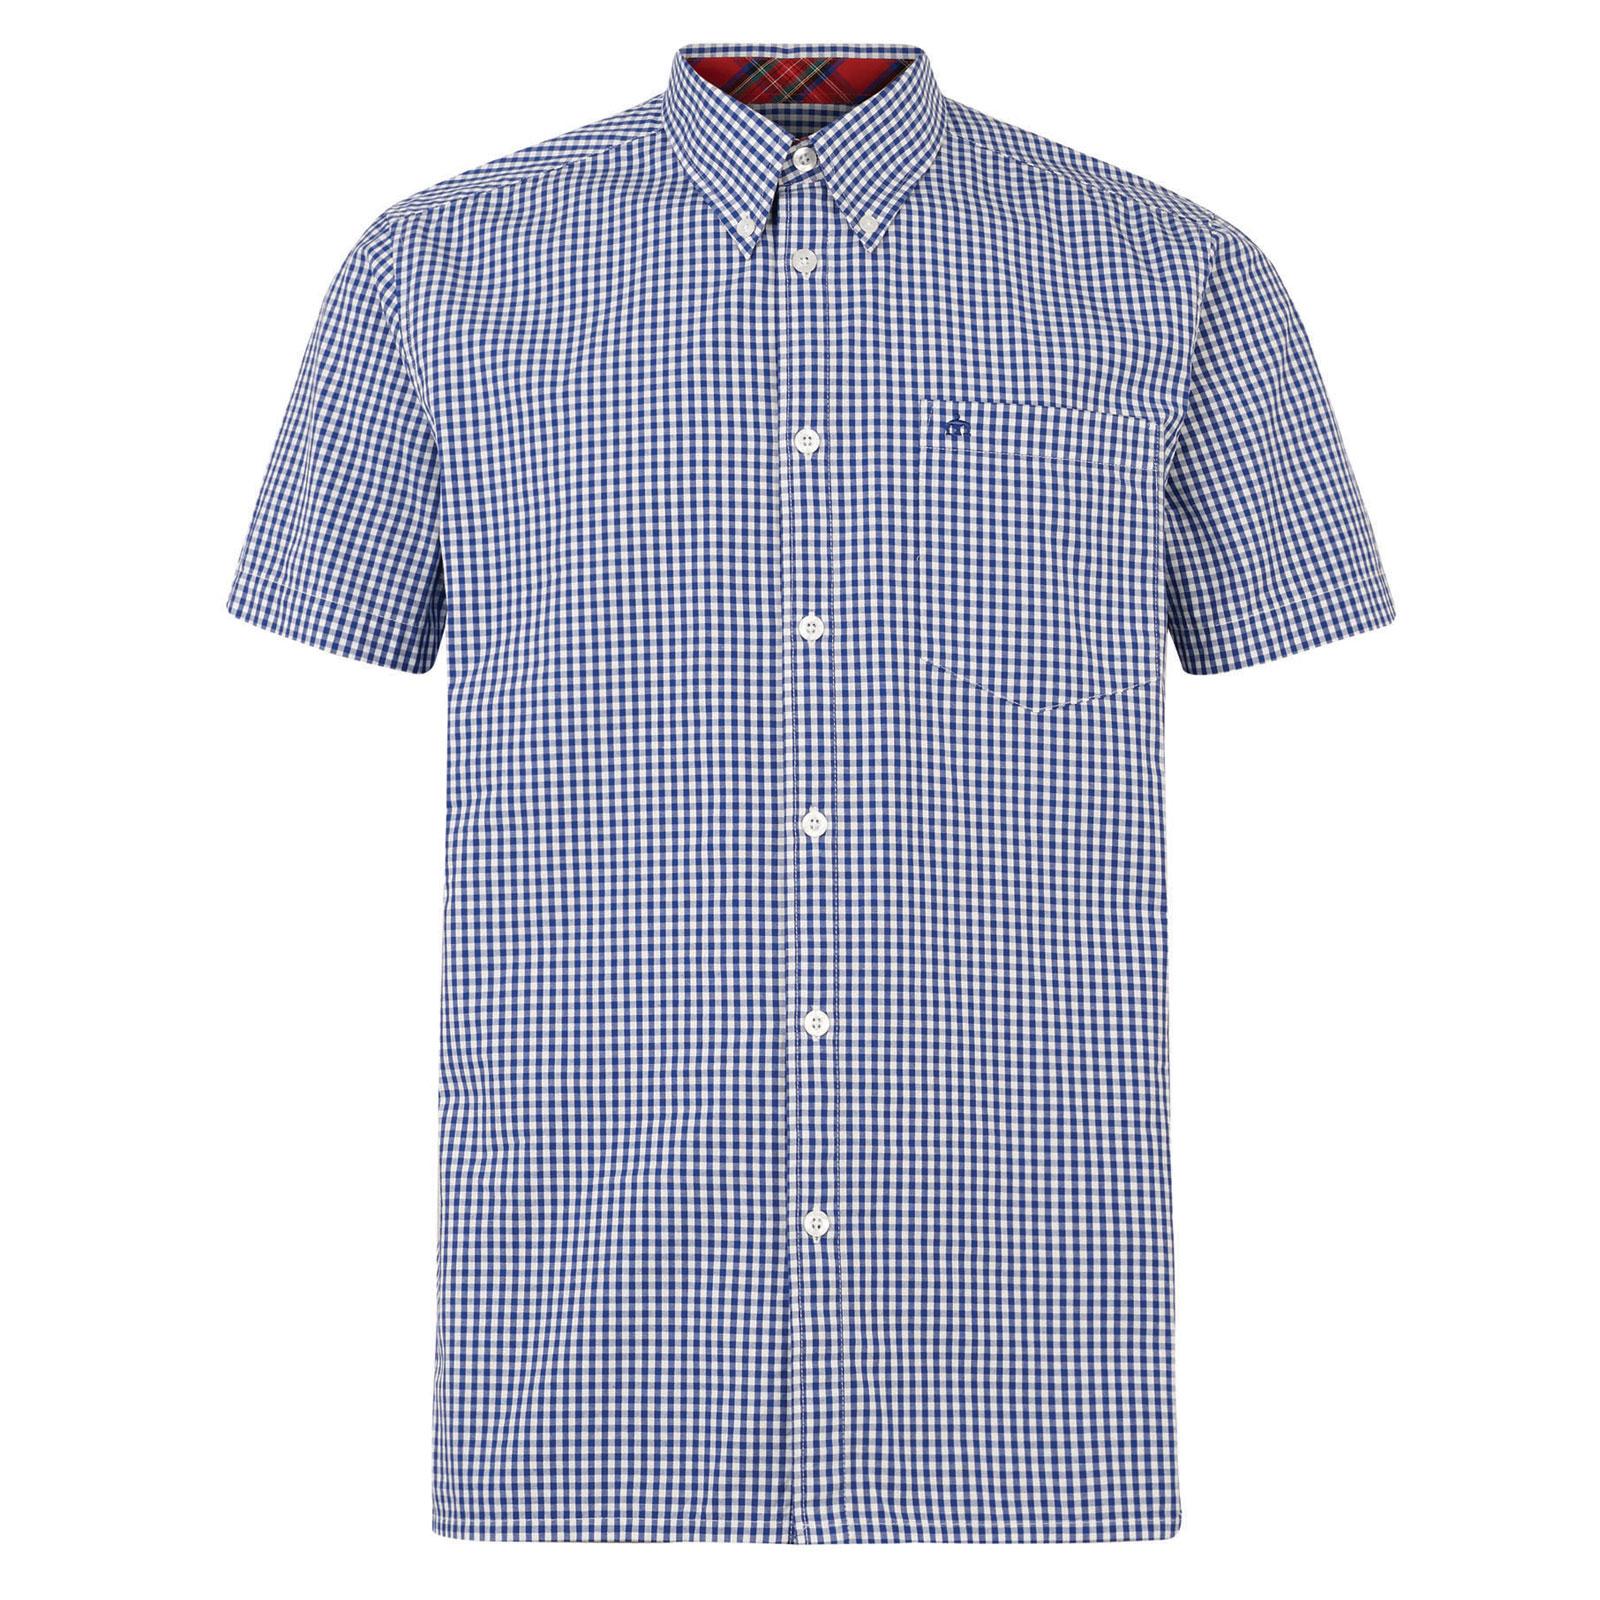 Koszula Terry Shirt Niebieska